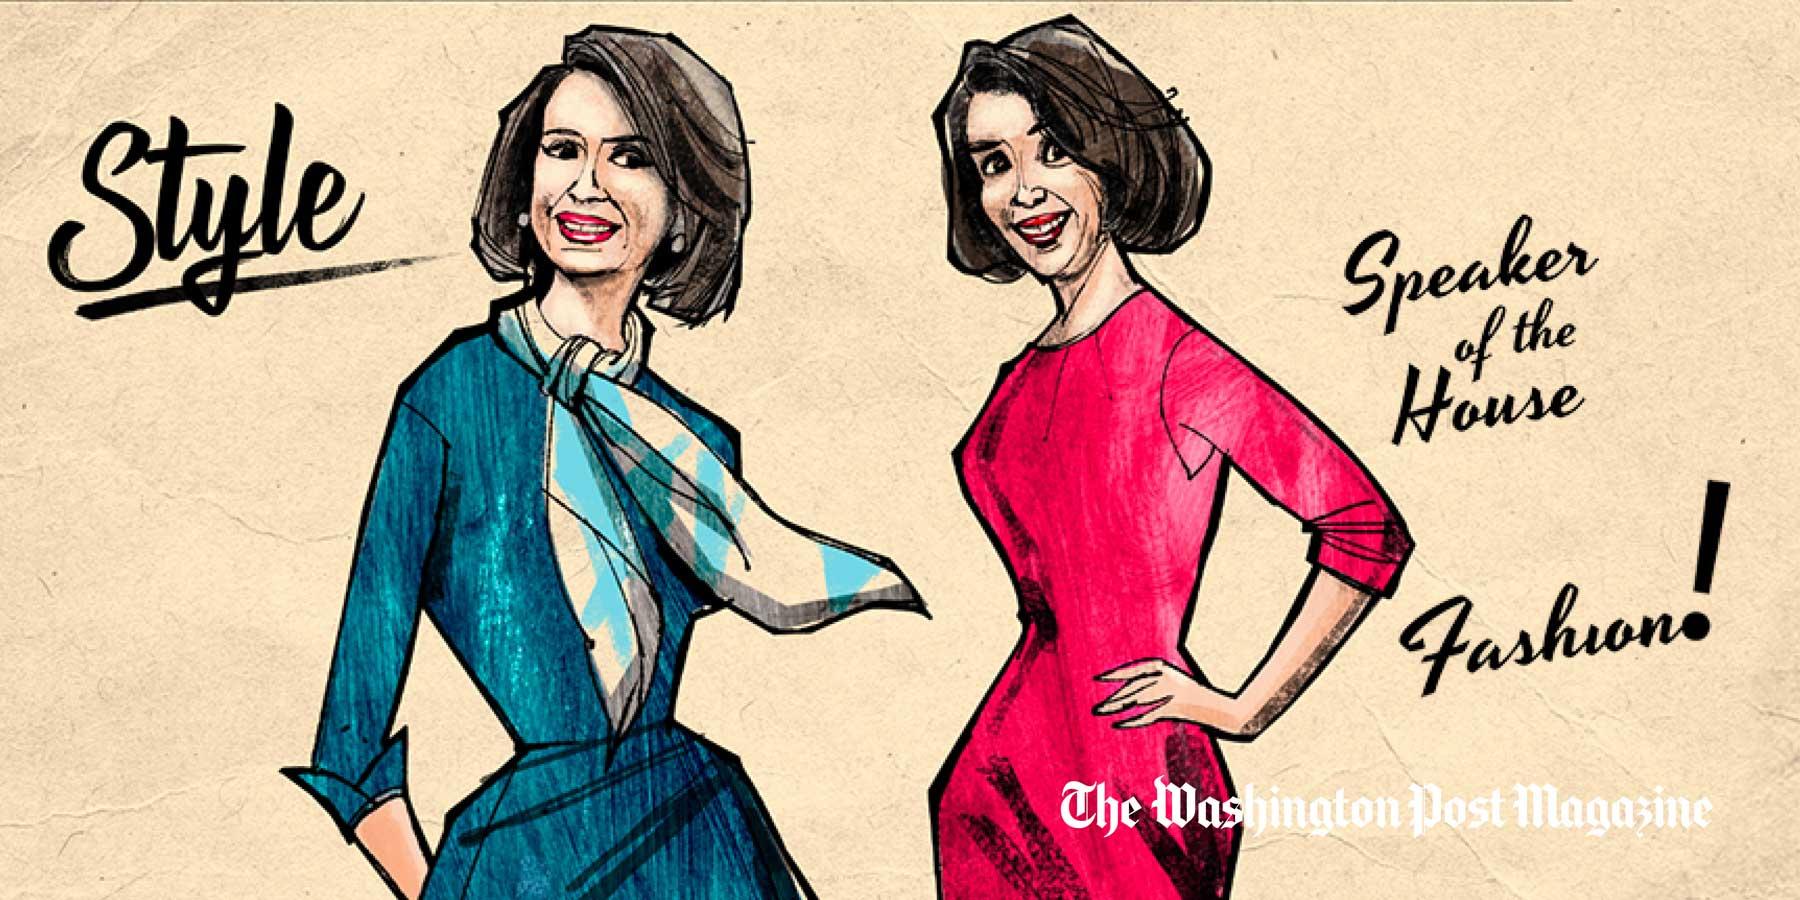 washingtonpost.com - Christina Binkley - She may not acknowledge it, but Nancy Pelosi is a fashion icon